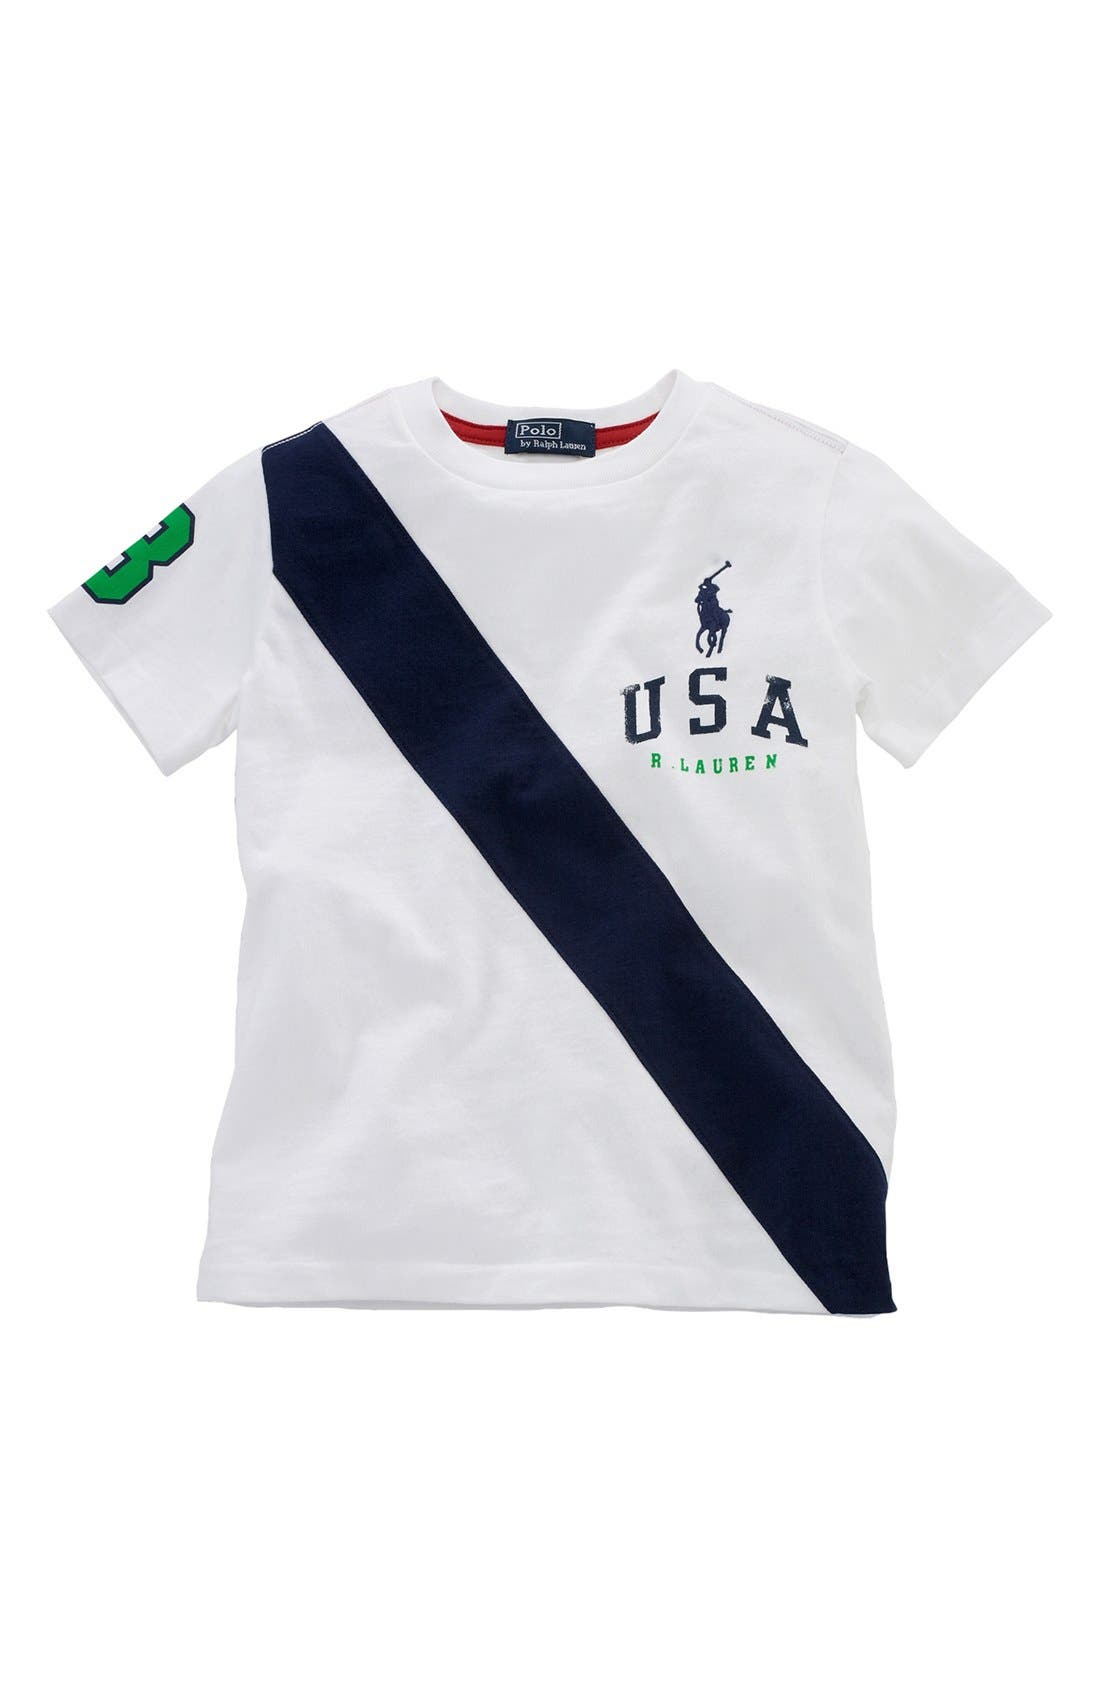 Alternate Image 1 Selected - Polo Ralph Lauren 'USA Banner' T-Shirt (Toddler)